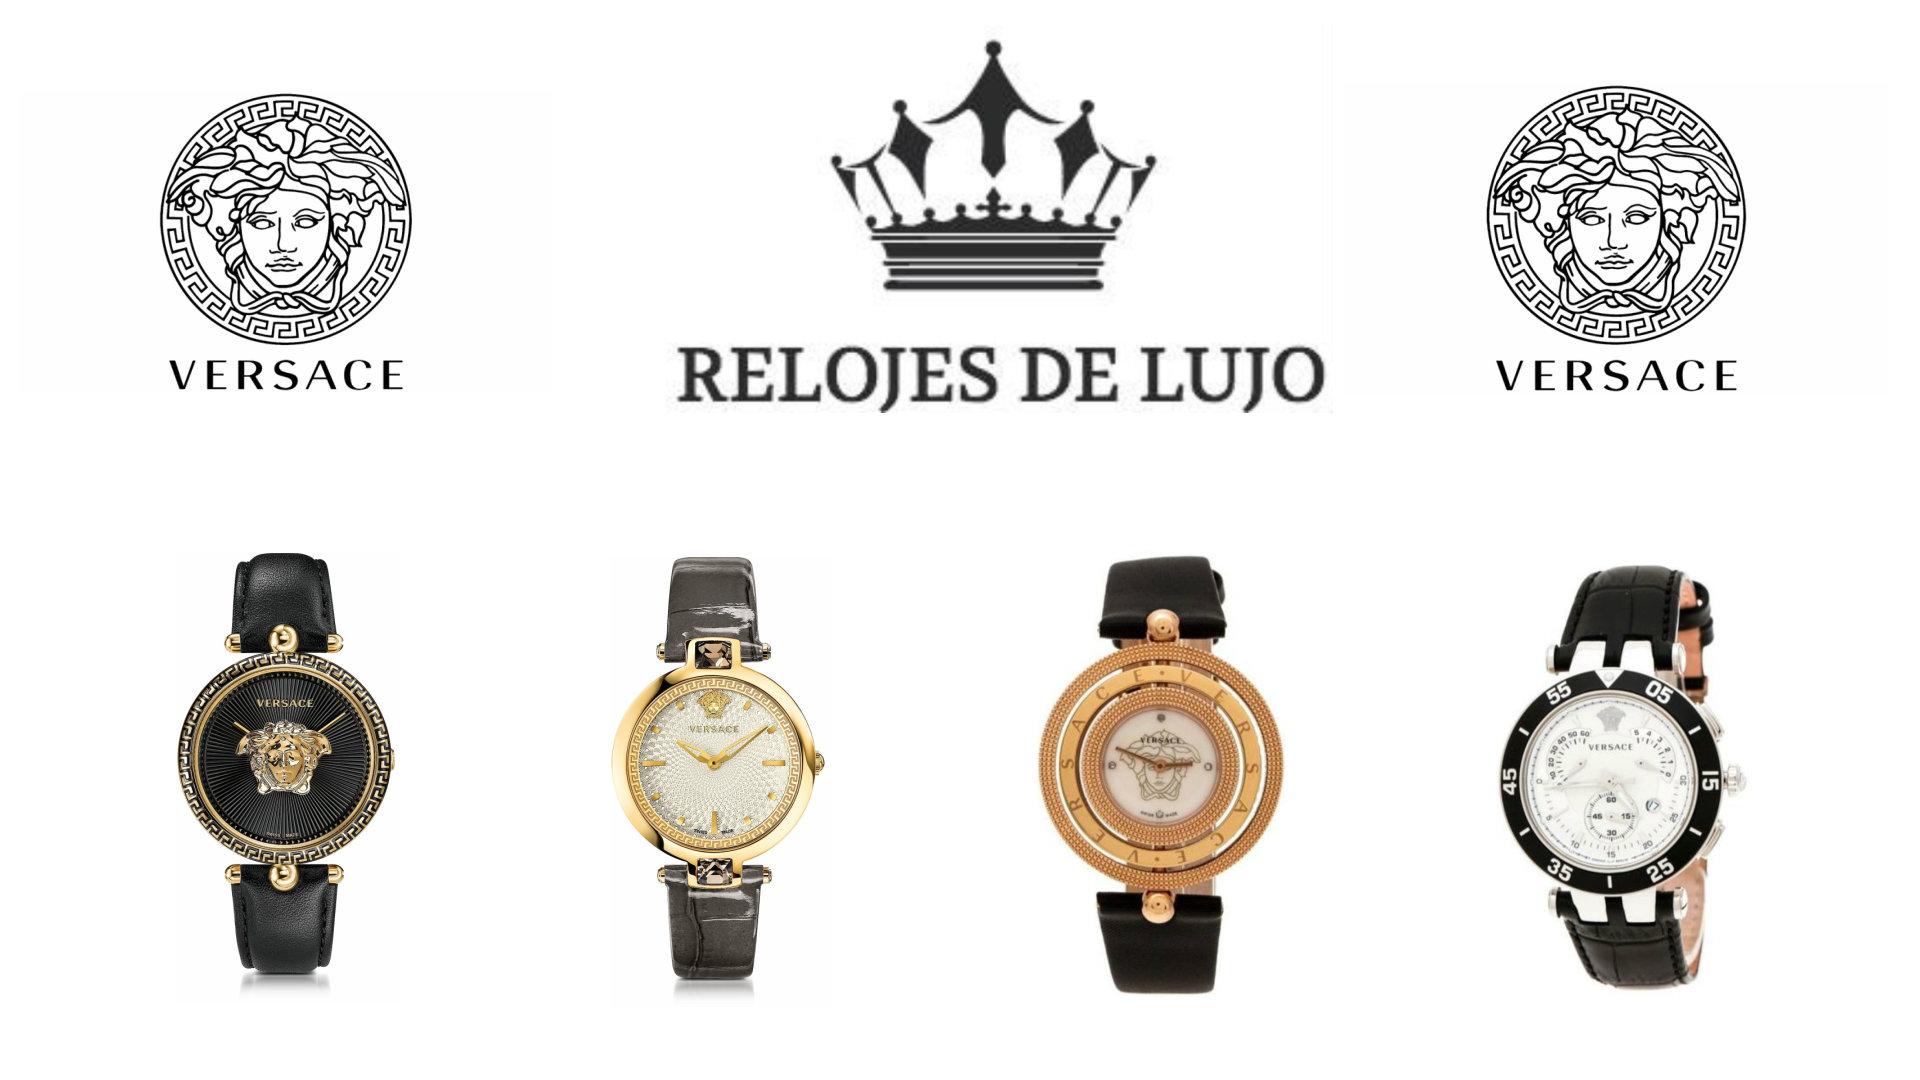 relojes versace